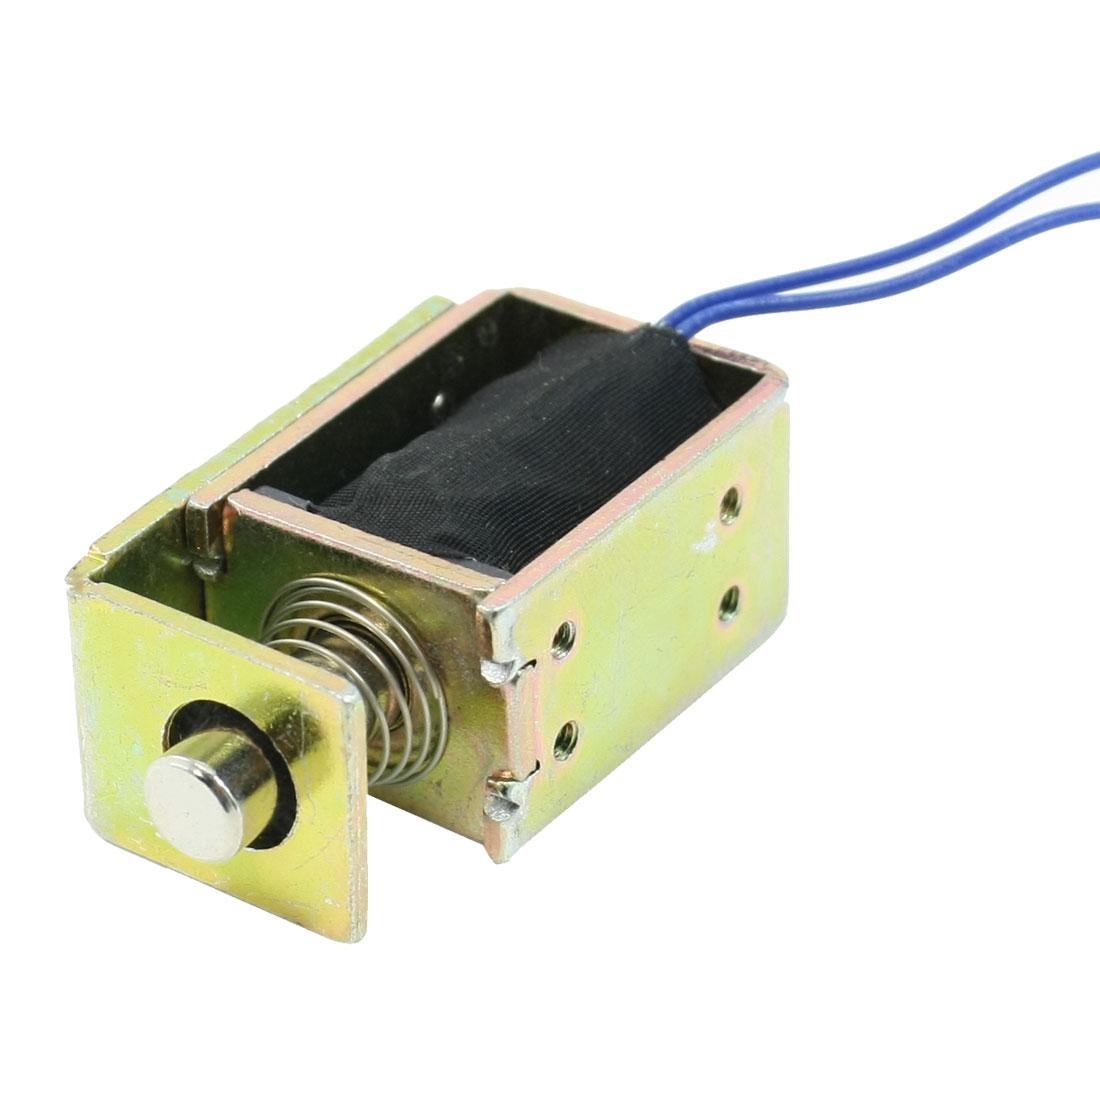 Linear Motion Open Frame Pull Type Electromagnet Solenoid DC 12V 0.5A 5mm 55N